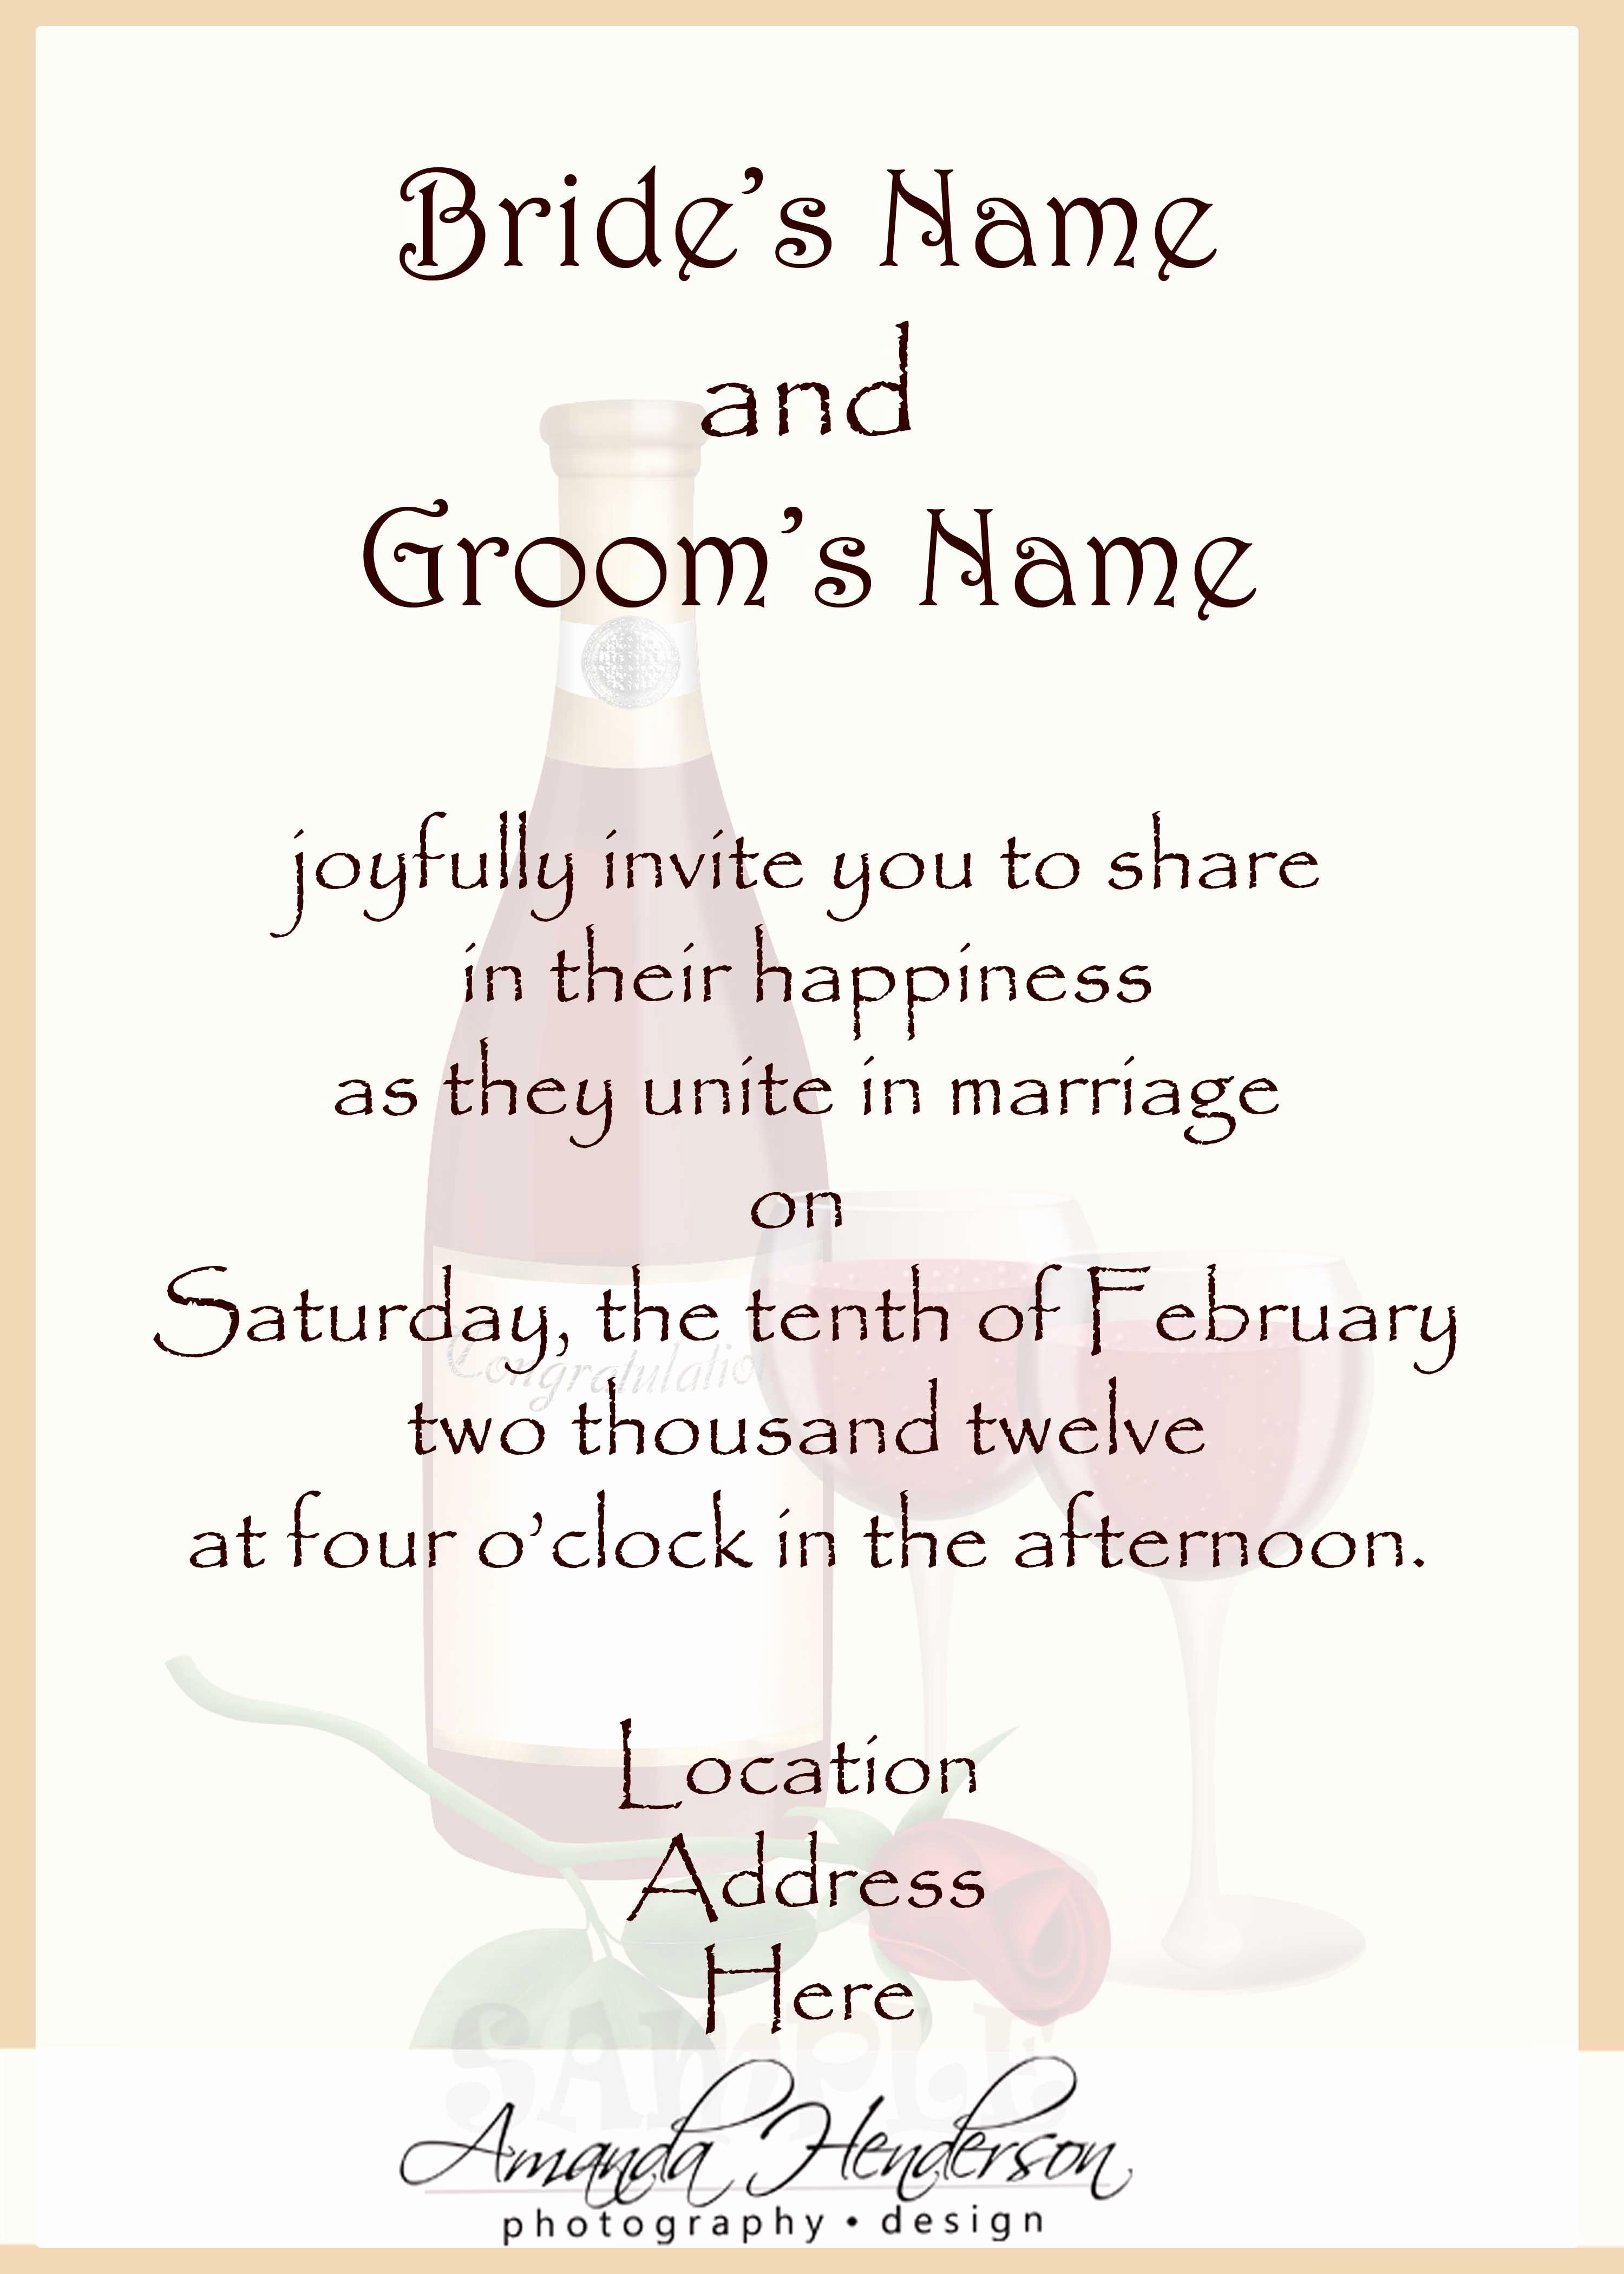 Outdoor Wedding Invitation Wording Fresh Wedding Invitation Wording Samples